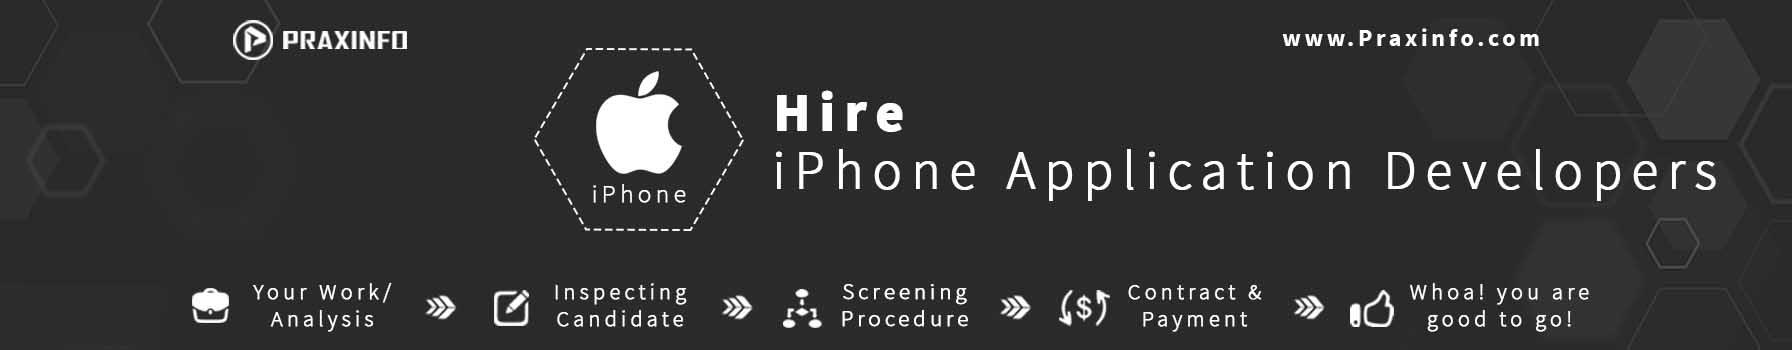 hire-iphone-Applicatiion-developer-banner-1.jpg